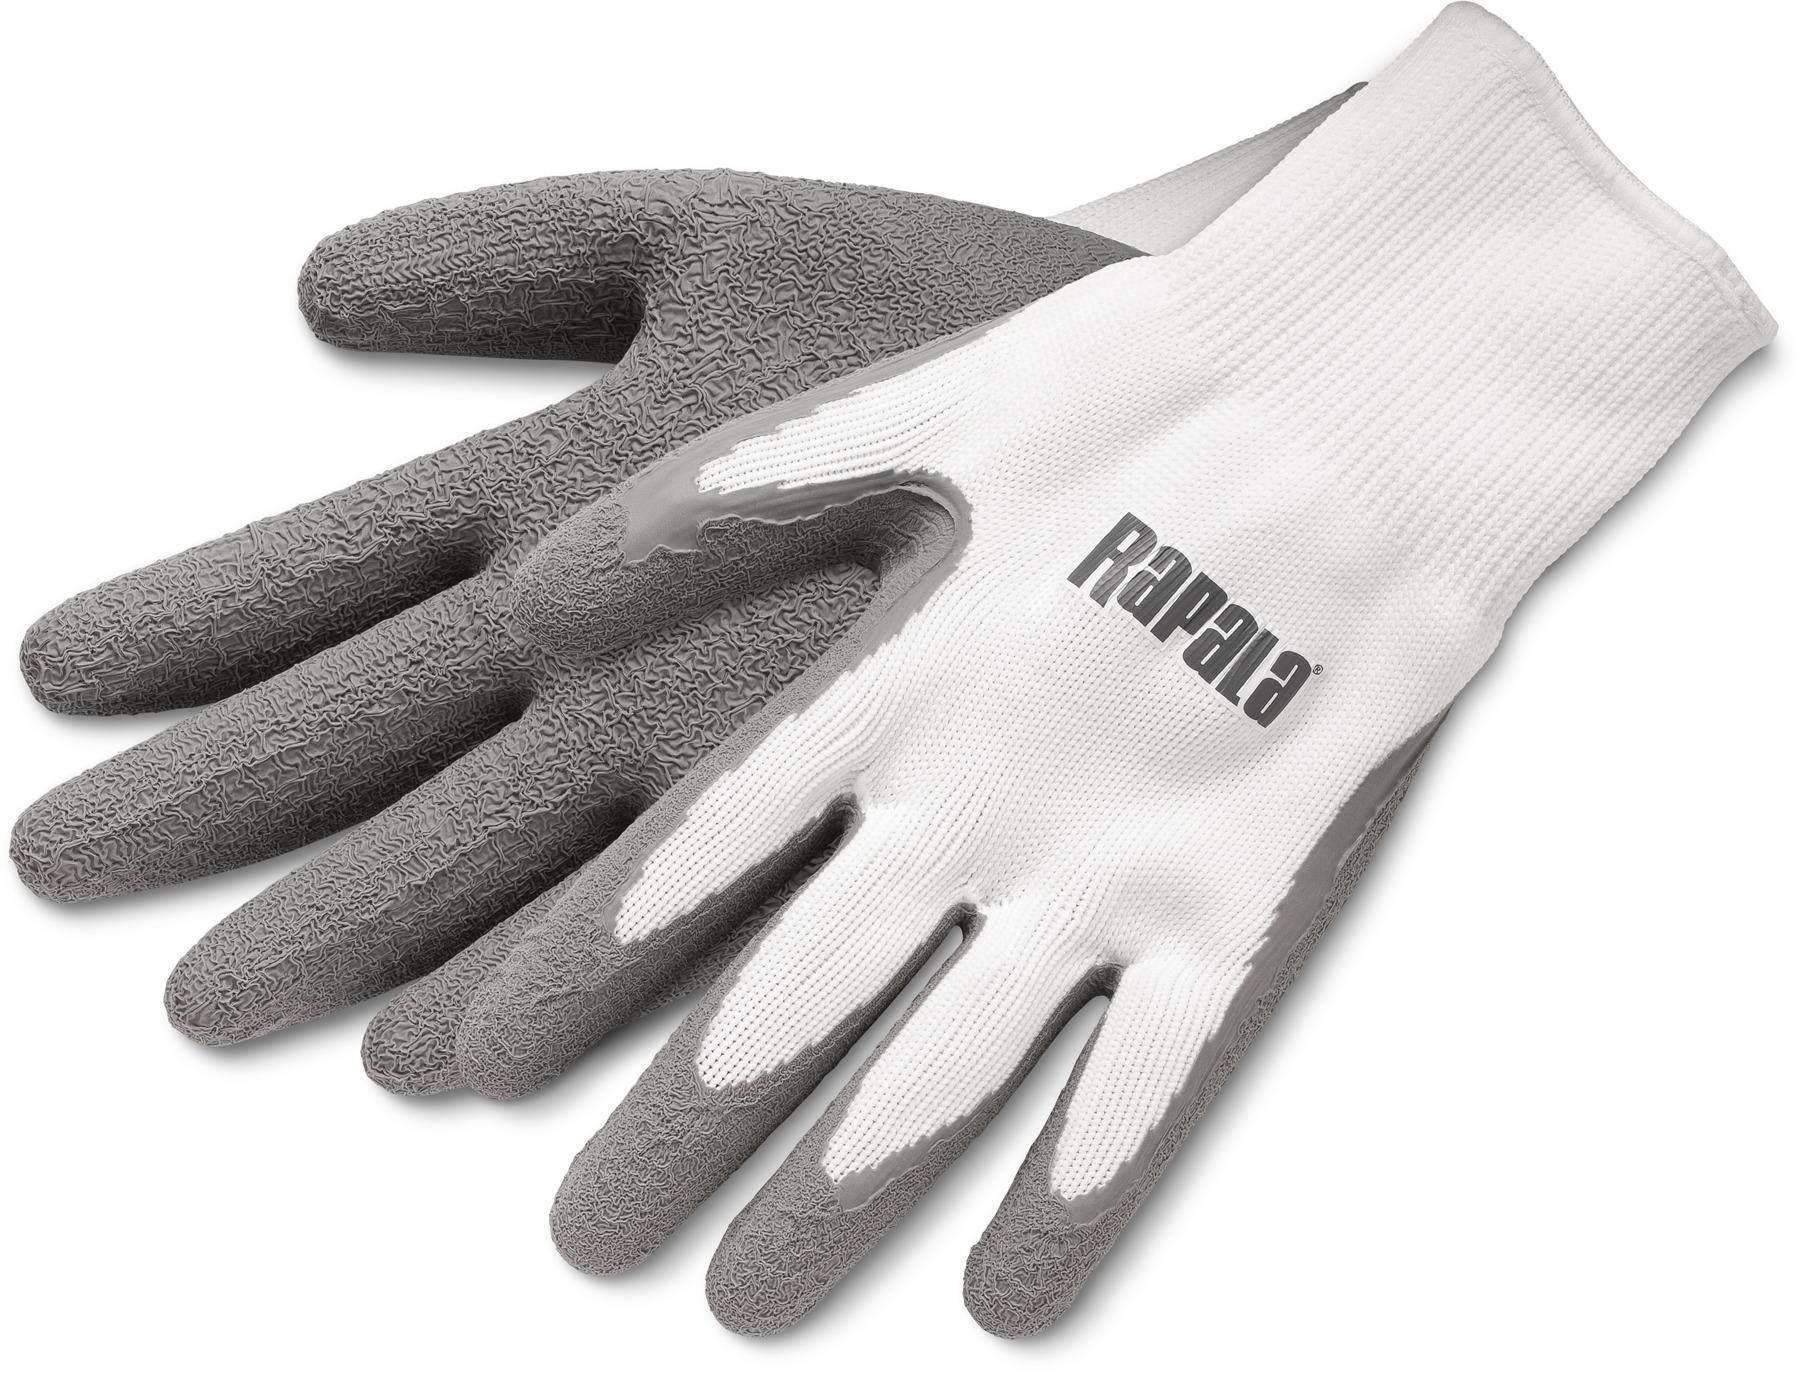 Rapala SAGXL Salt Angler's Gloves - XLarge